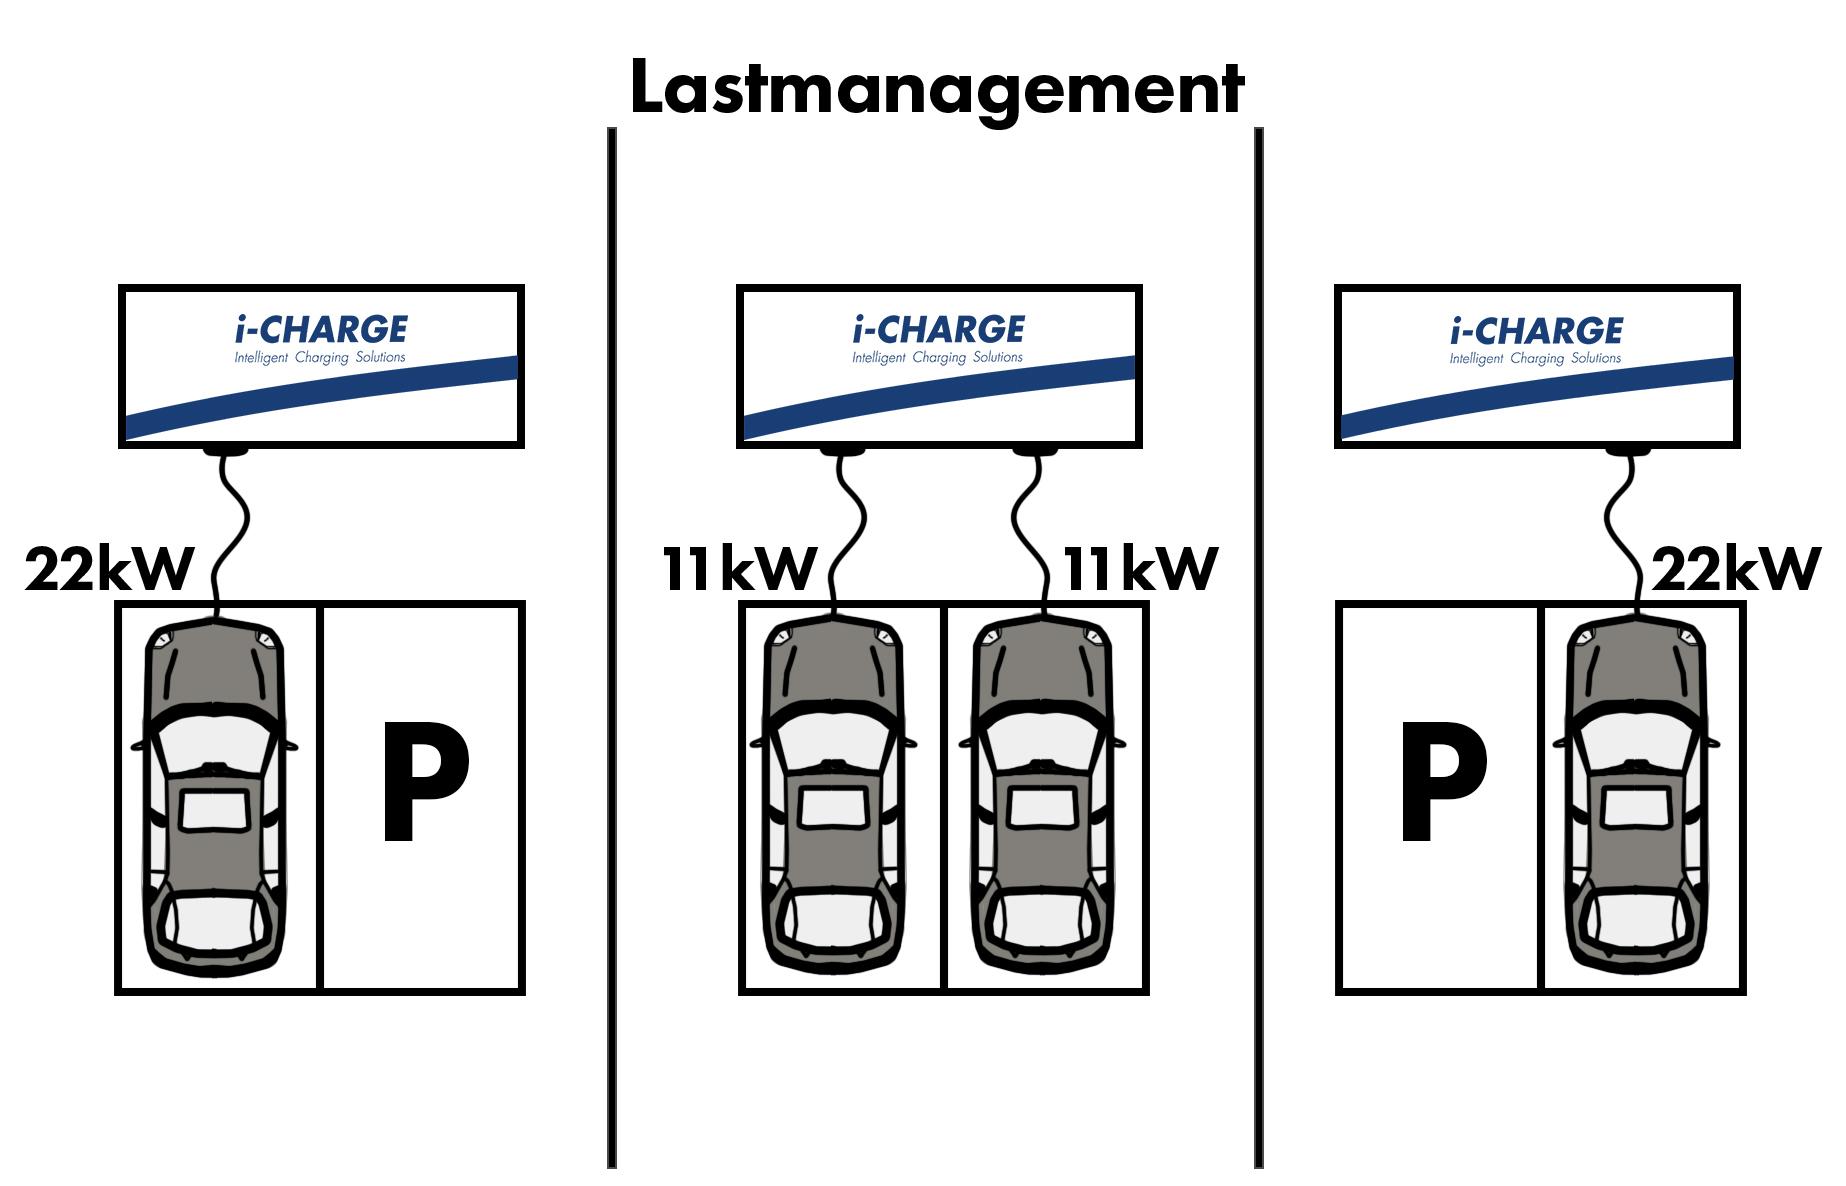 1 Stk Lastmanagement, Begrenzung der Gesamtleistung, 0-10V Eingang EMCEBELLEM